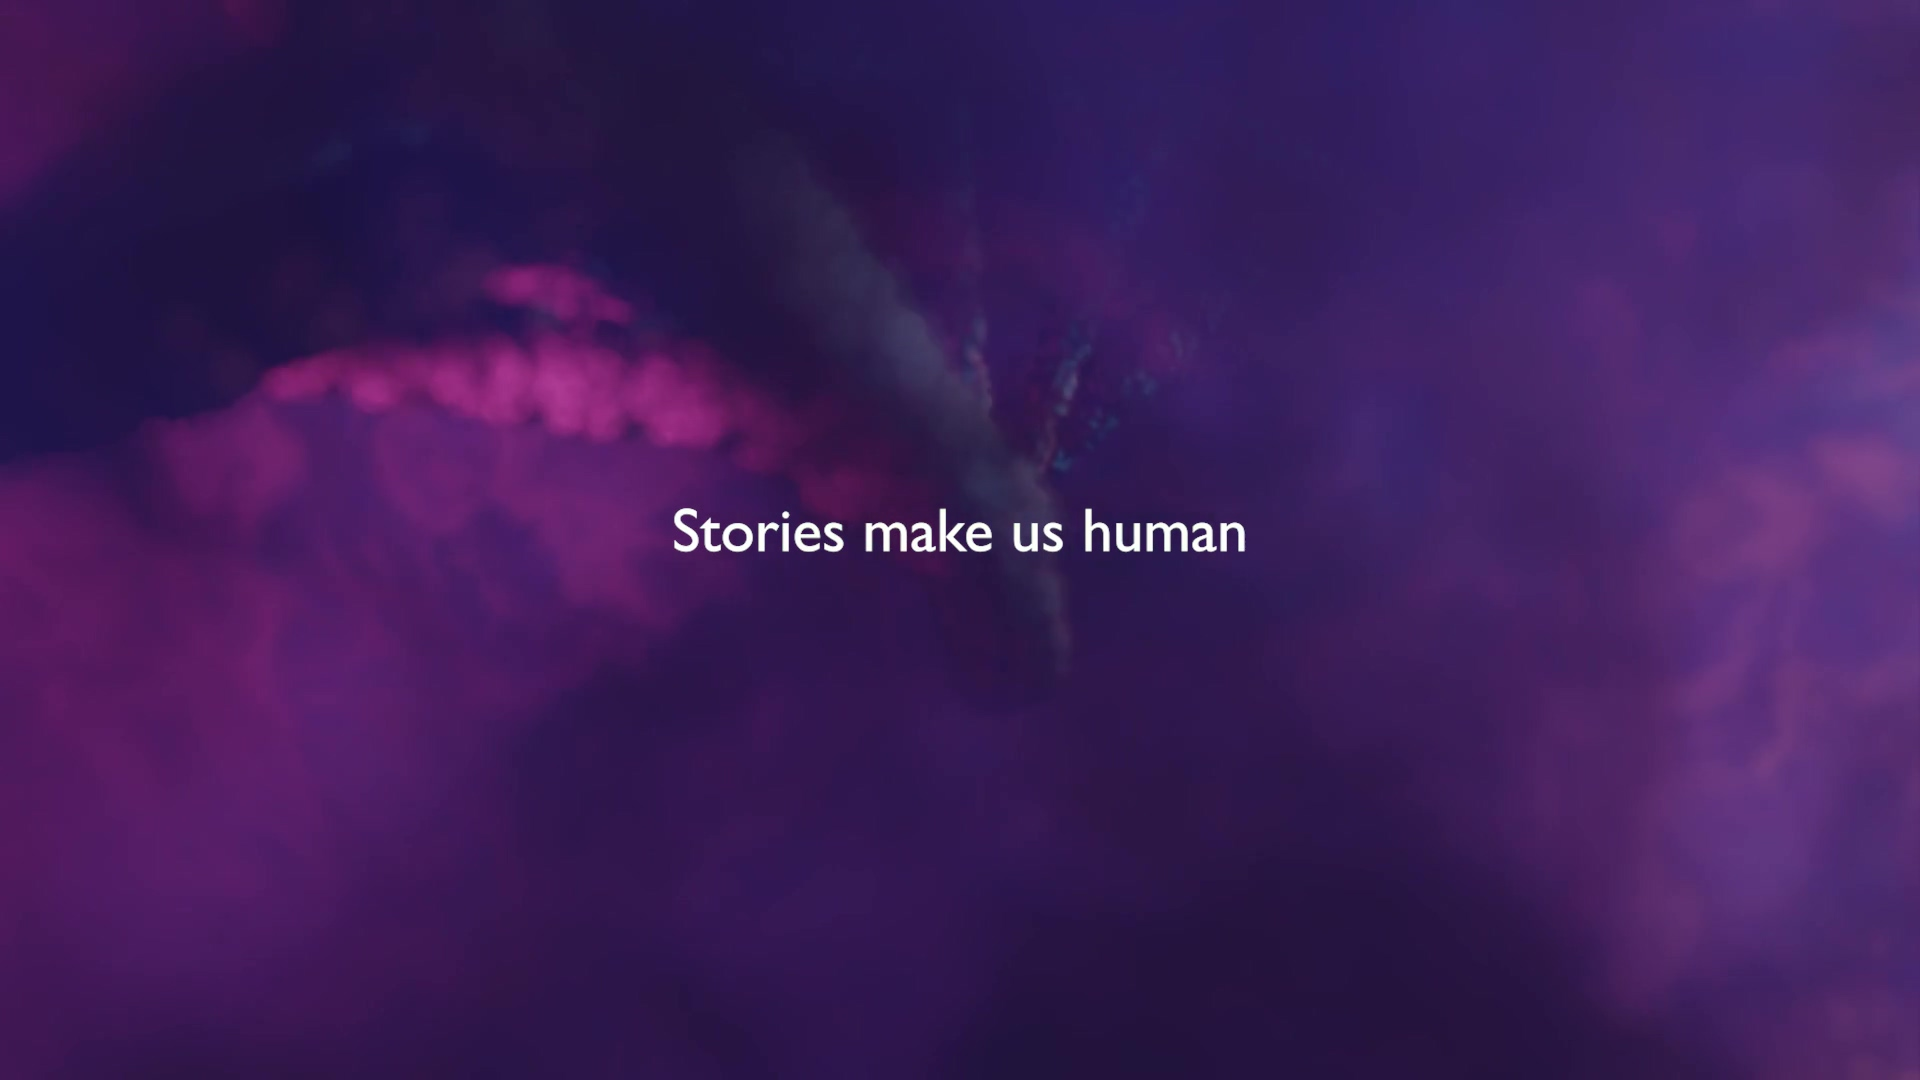 Stories Make us Human